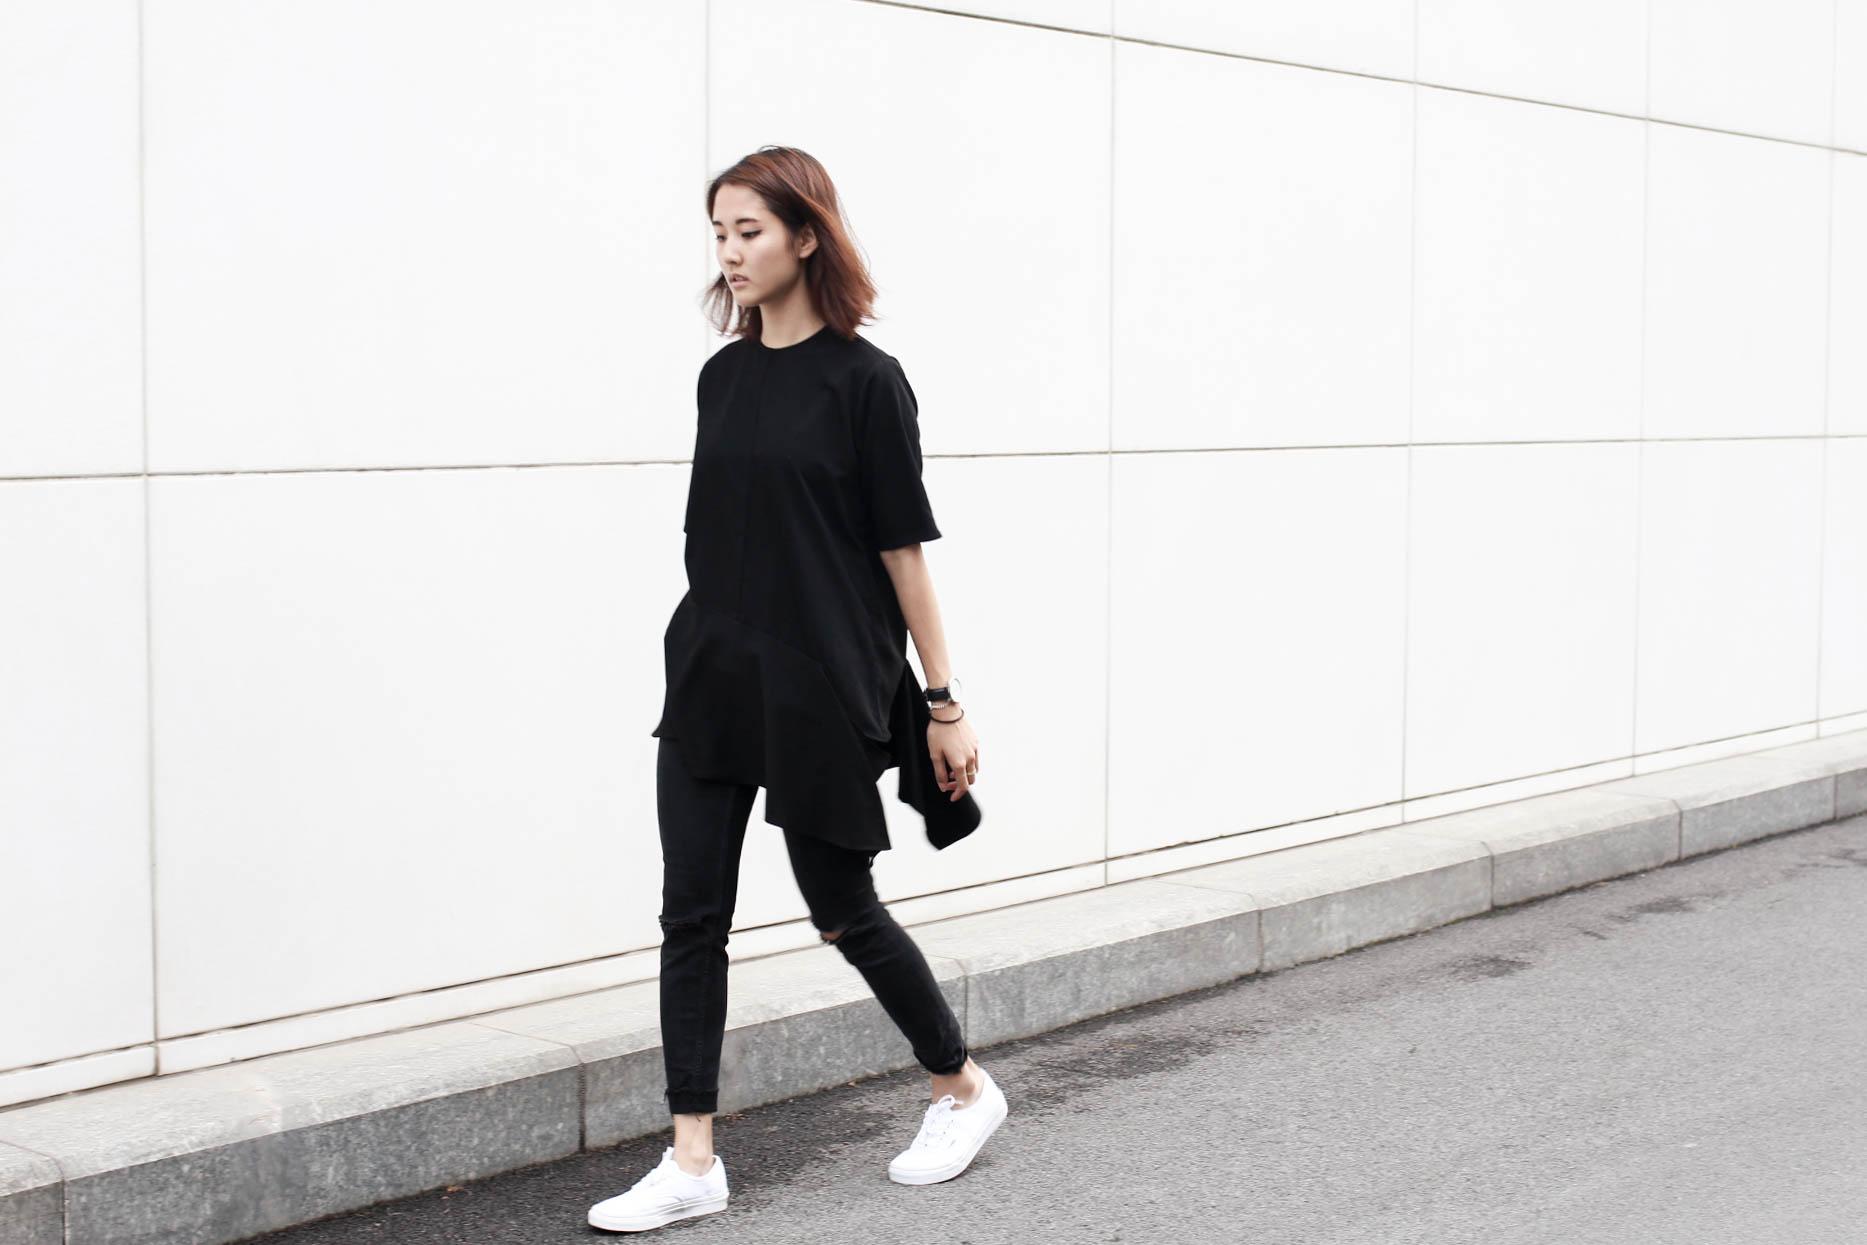 vietnamese fashion blogger julia doan